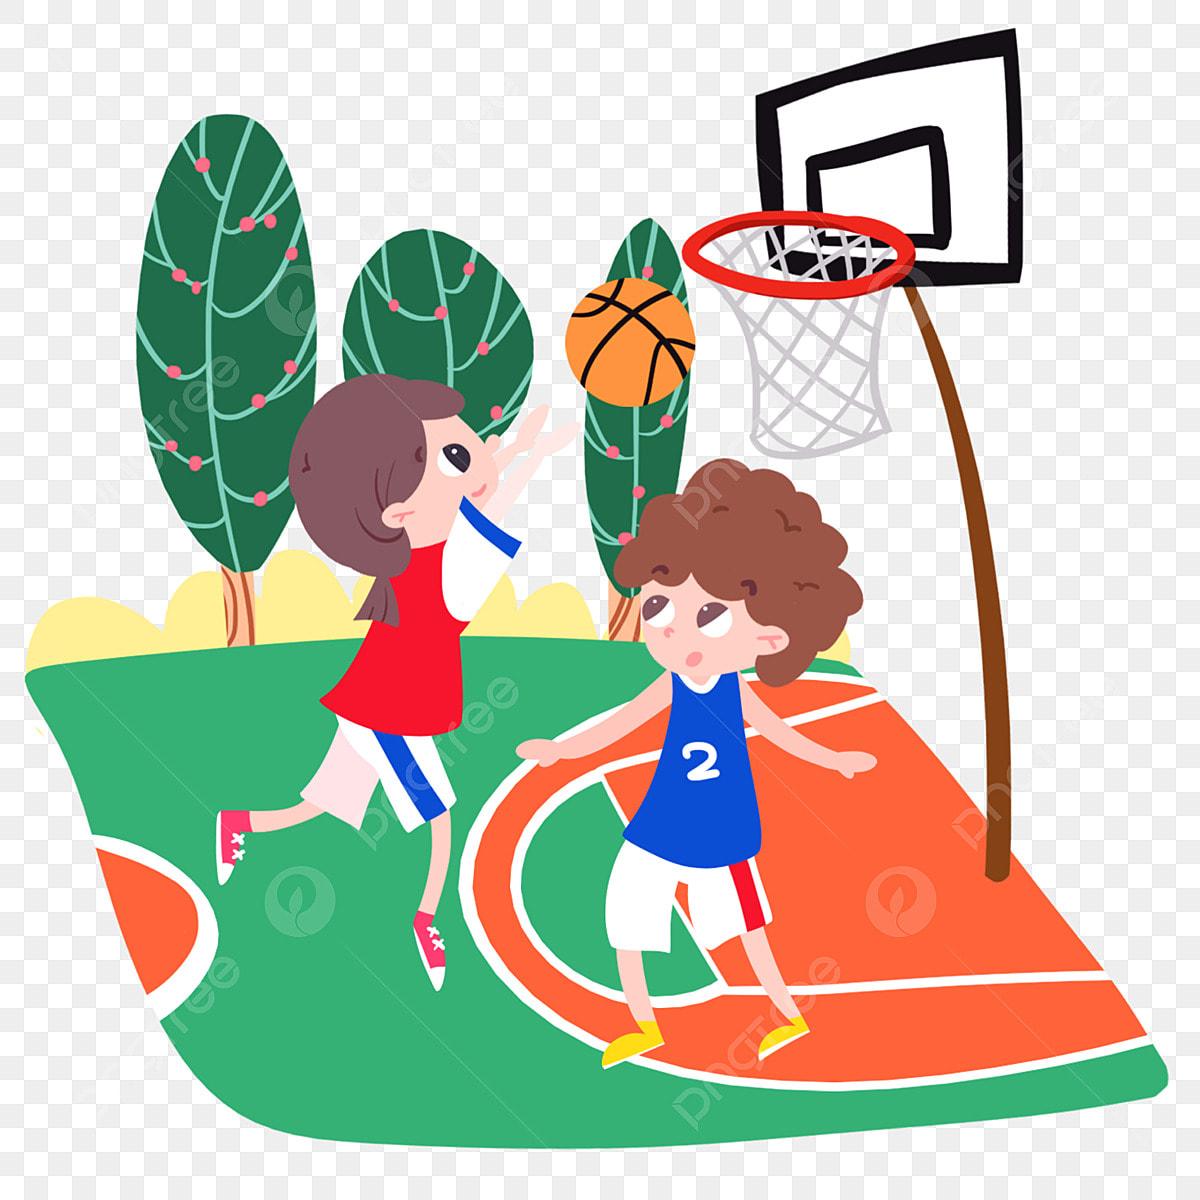 Gambar Kartun Permainan Bola Basket